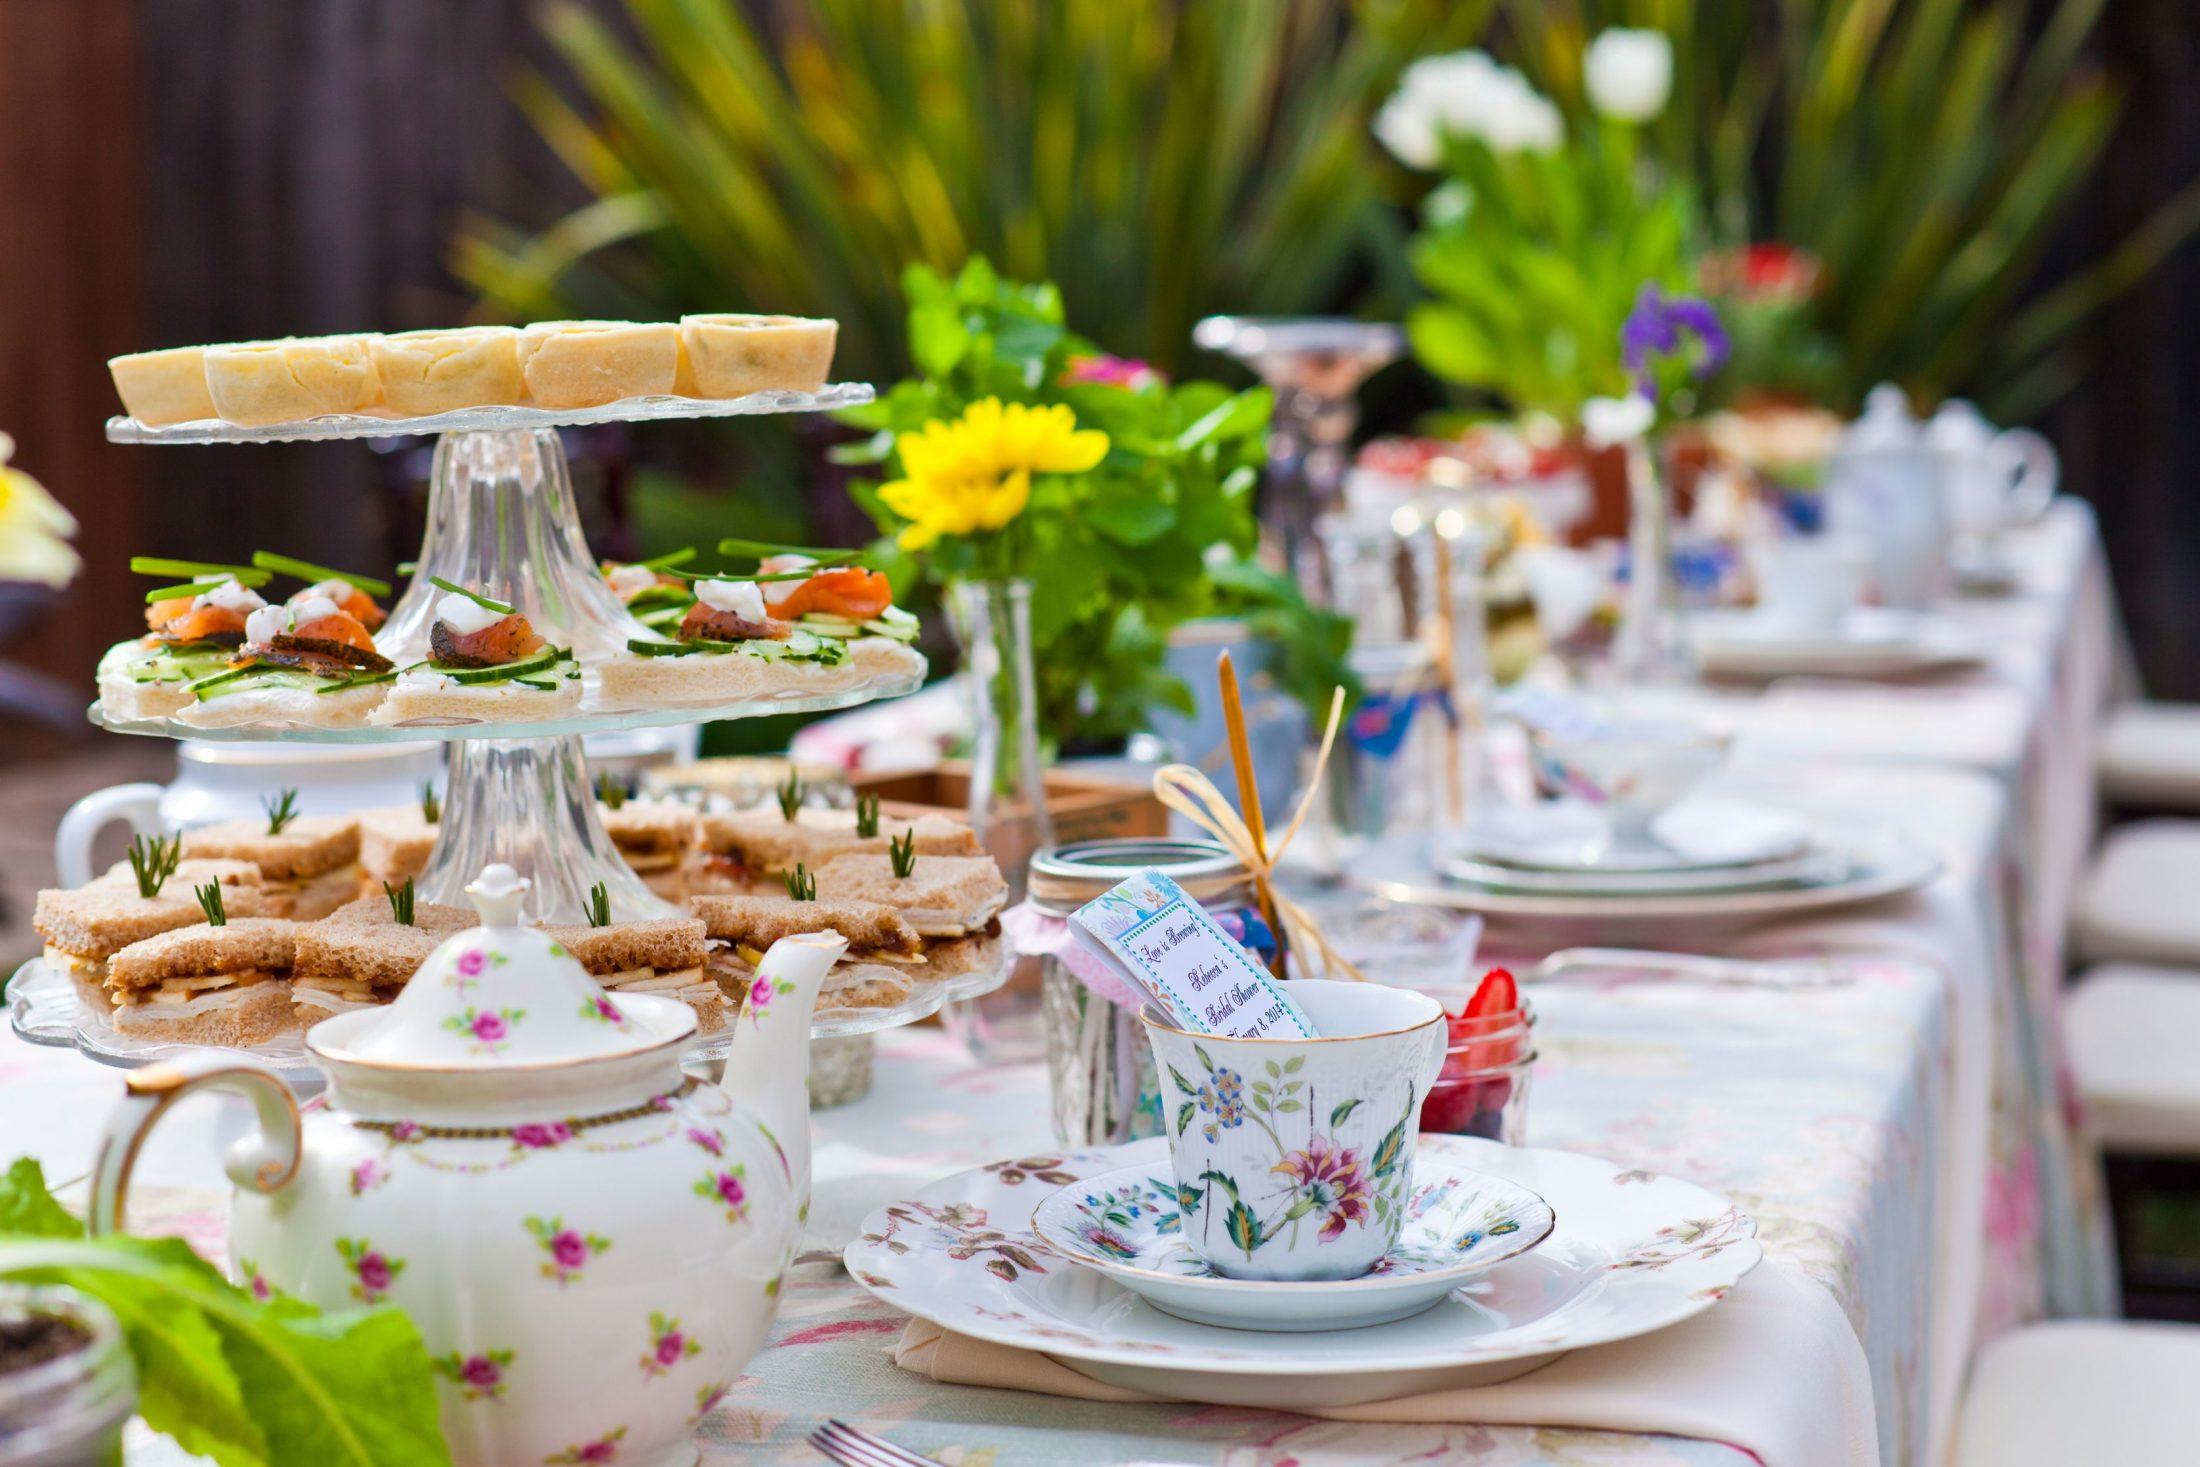 Teaparty: Tea Party Bridal Shower In Goleta, CA